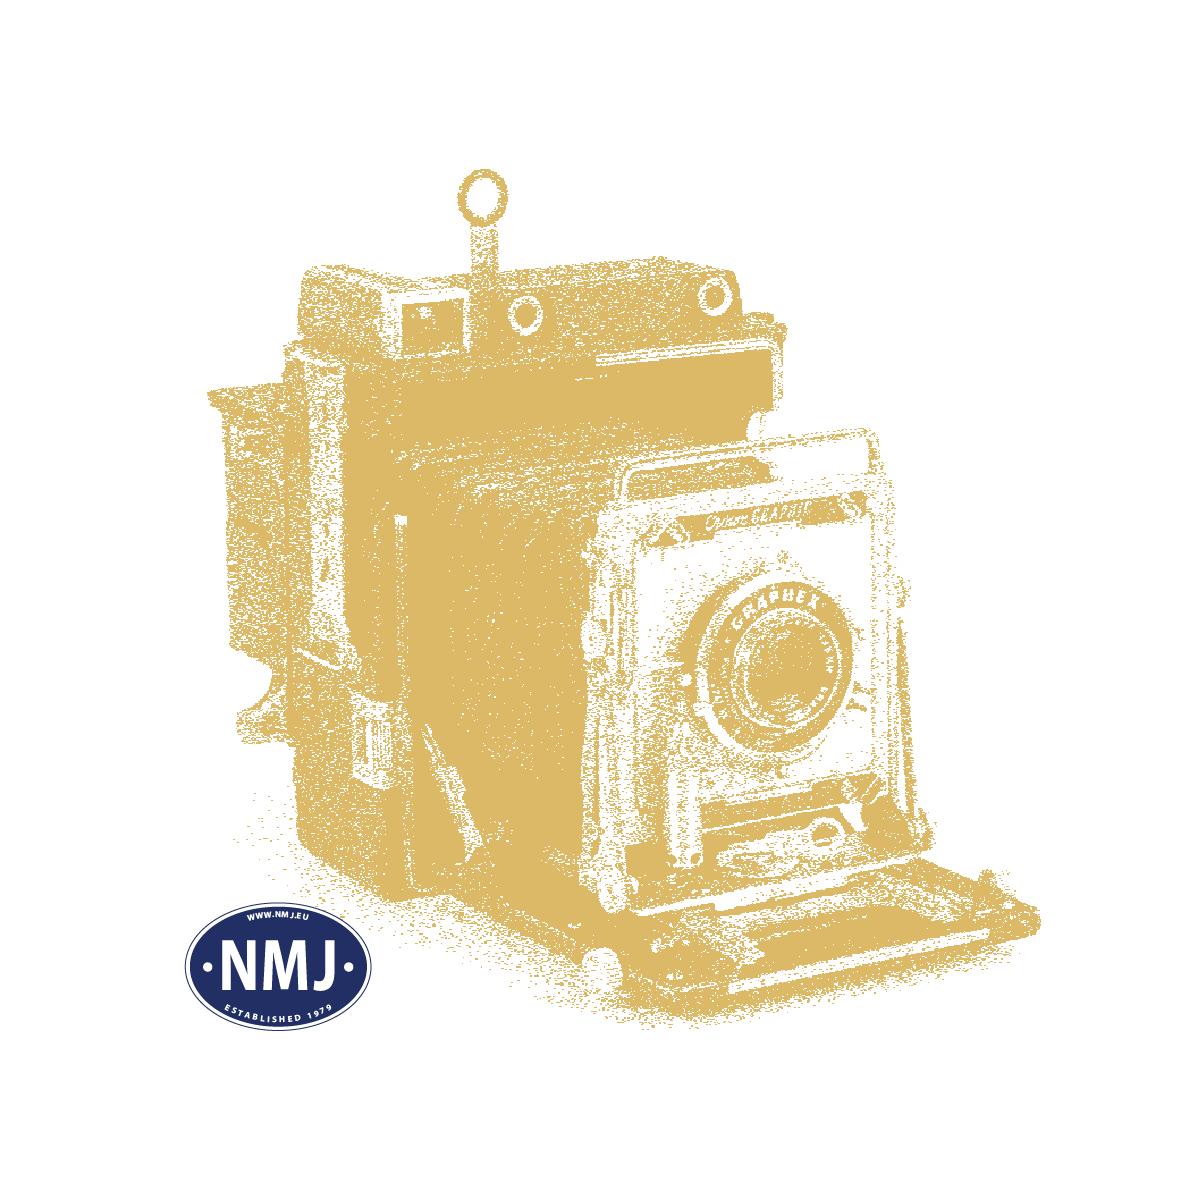 NMJT501.105 - NMJ Topline NSB Os 21 76 370 0 660-2